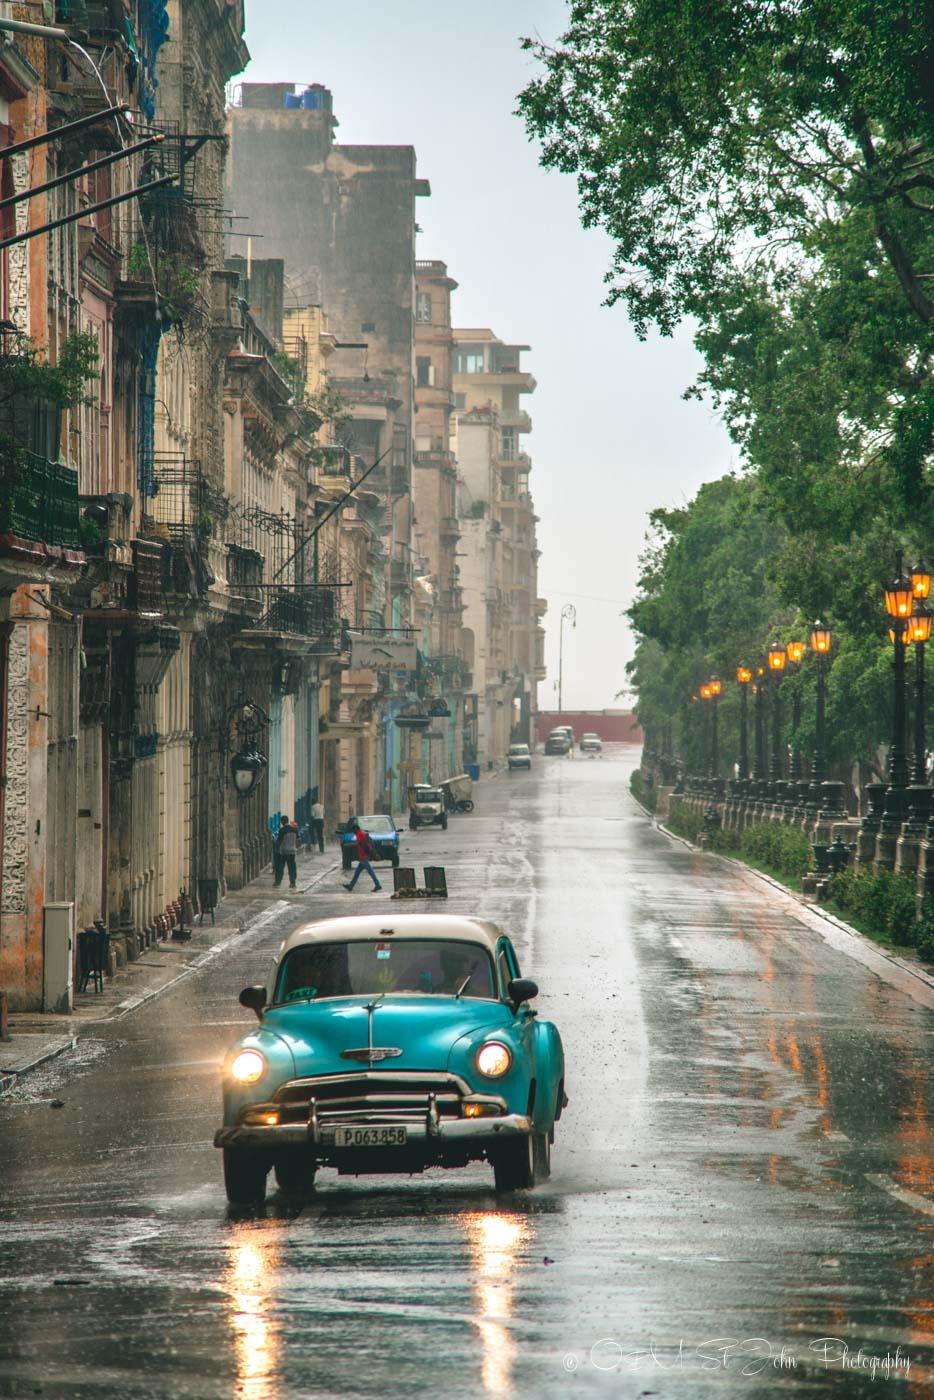 Cuba Itinerary: Classic Cars in Havana